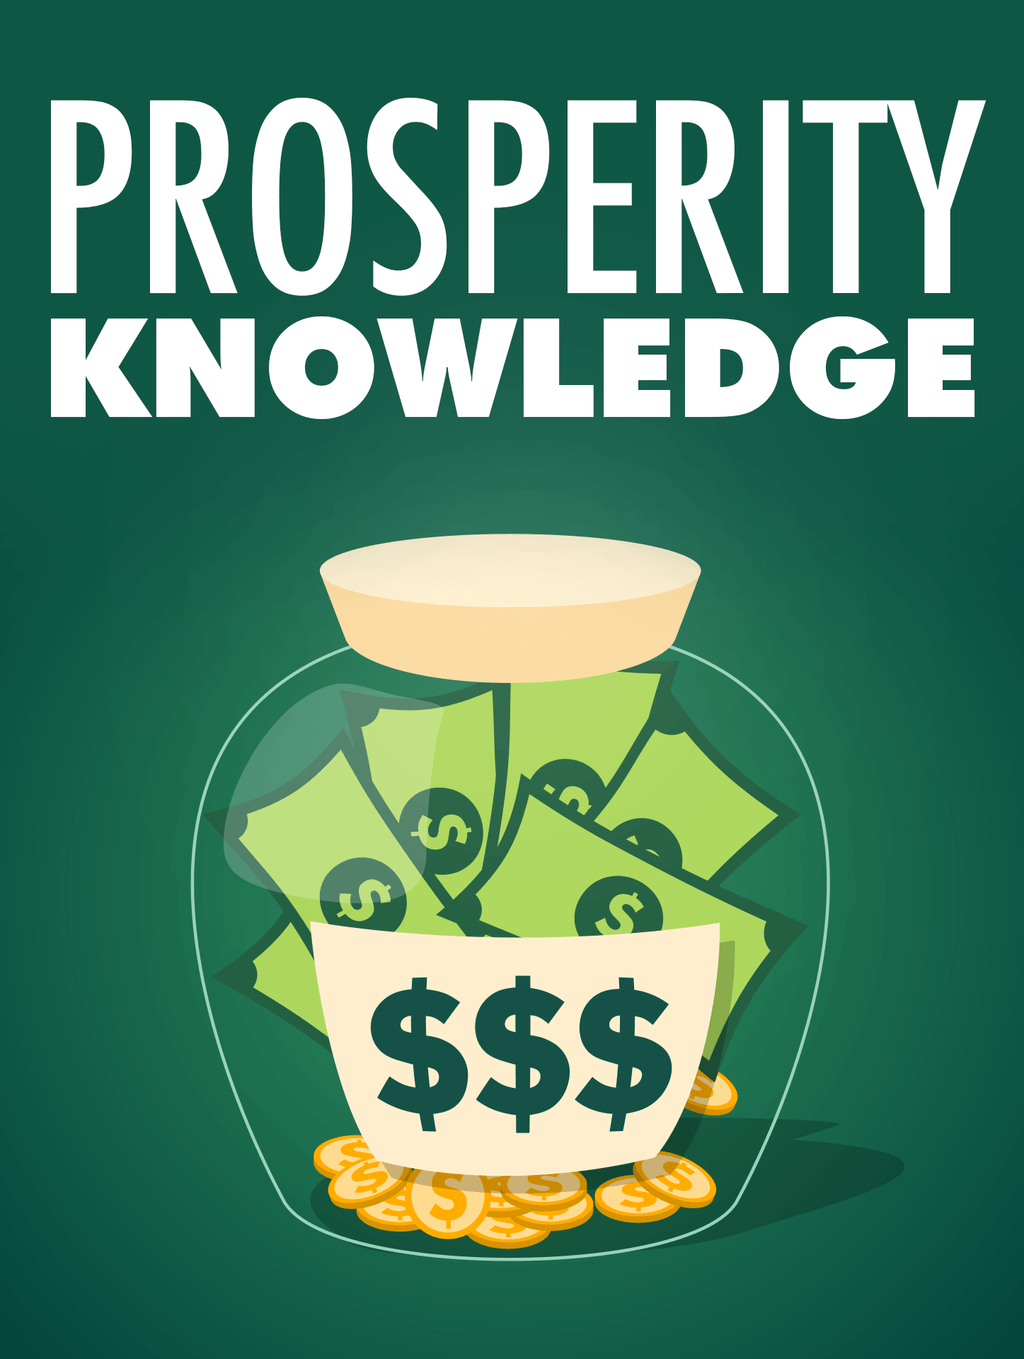 Prosperity Knowledge 1 - The Lighter Side - Day Twenty One - Prosperity Knowledge